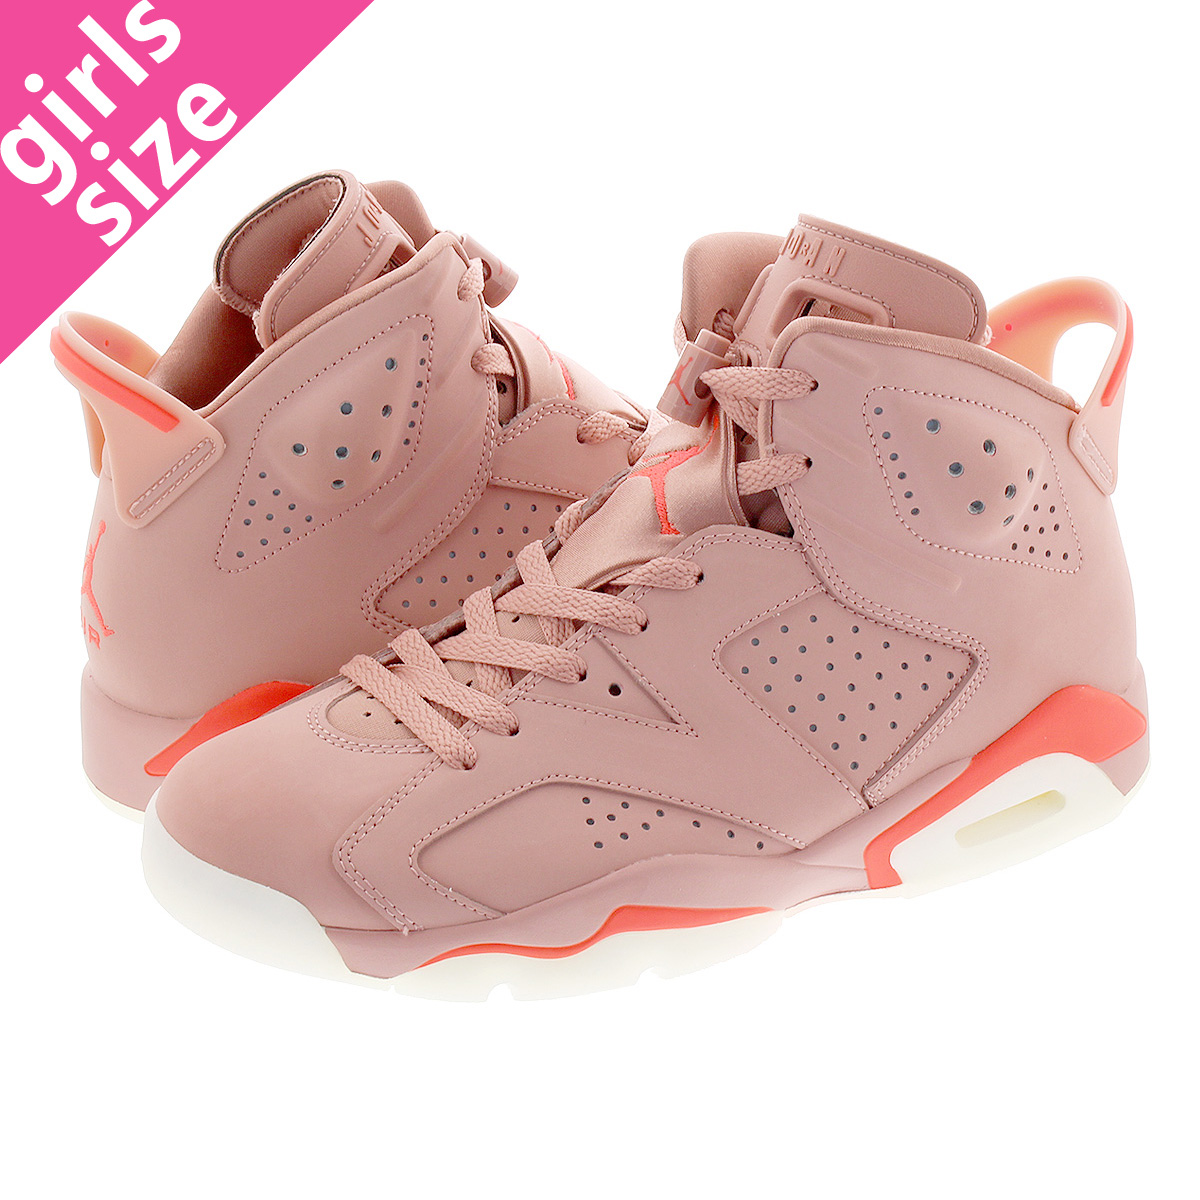 new style 9c776 2b969 NIKE WMNS AIR JORDAN 6 RETRO NRG Nike women Air Jordan 6 nostalgic NRG RUST  PINK/BRIGHT CRIMSON ci0550-600